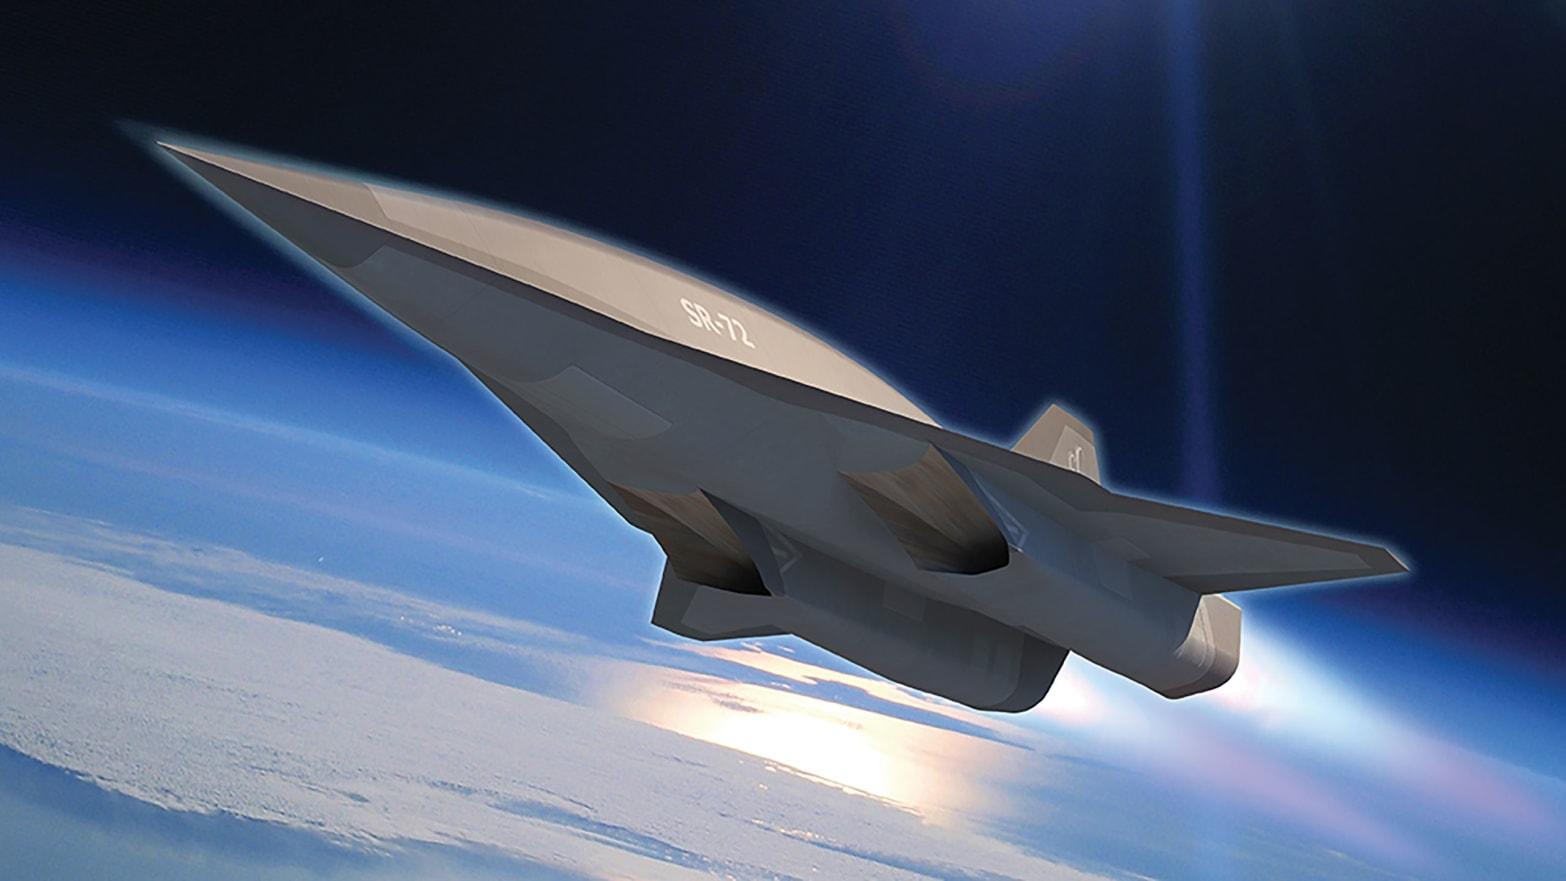 Secret 'Son of Blackbird' SR-72 Spy Plane Re-Emerges